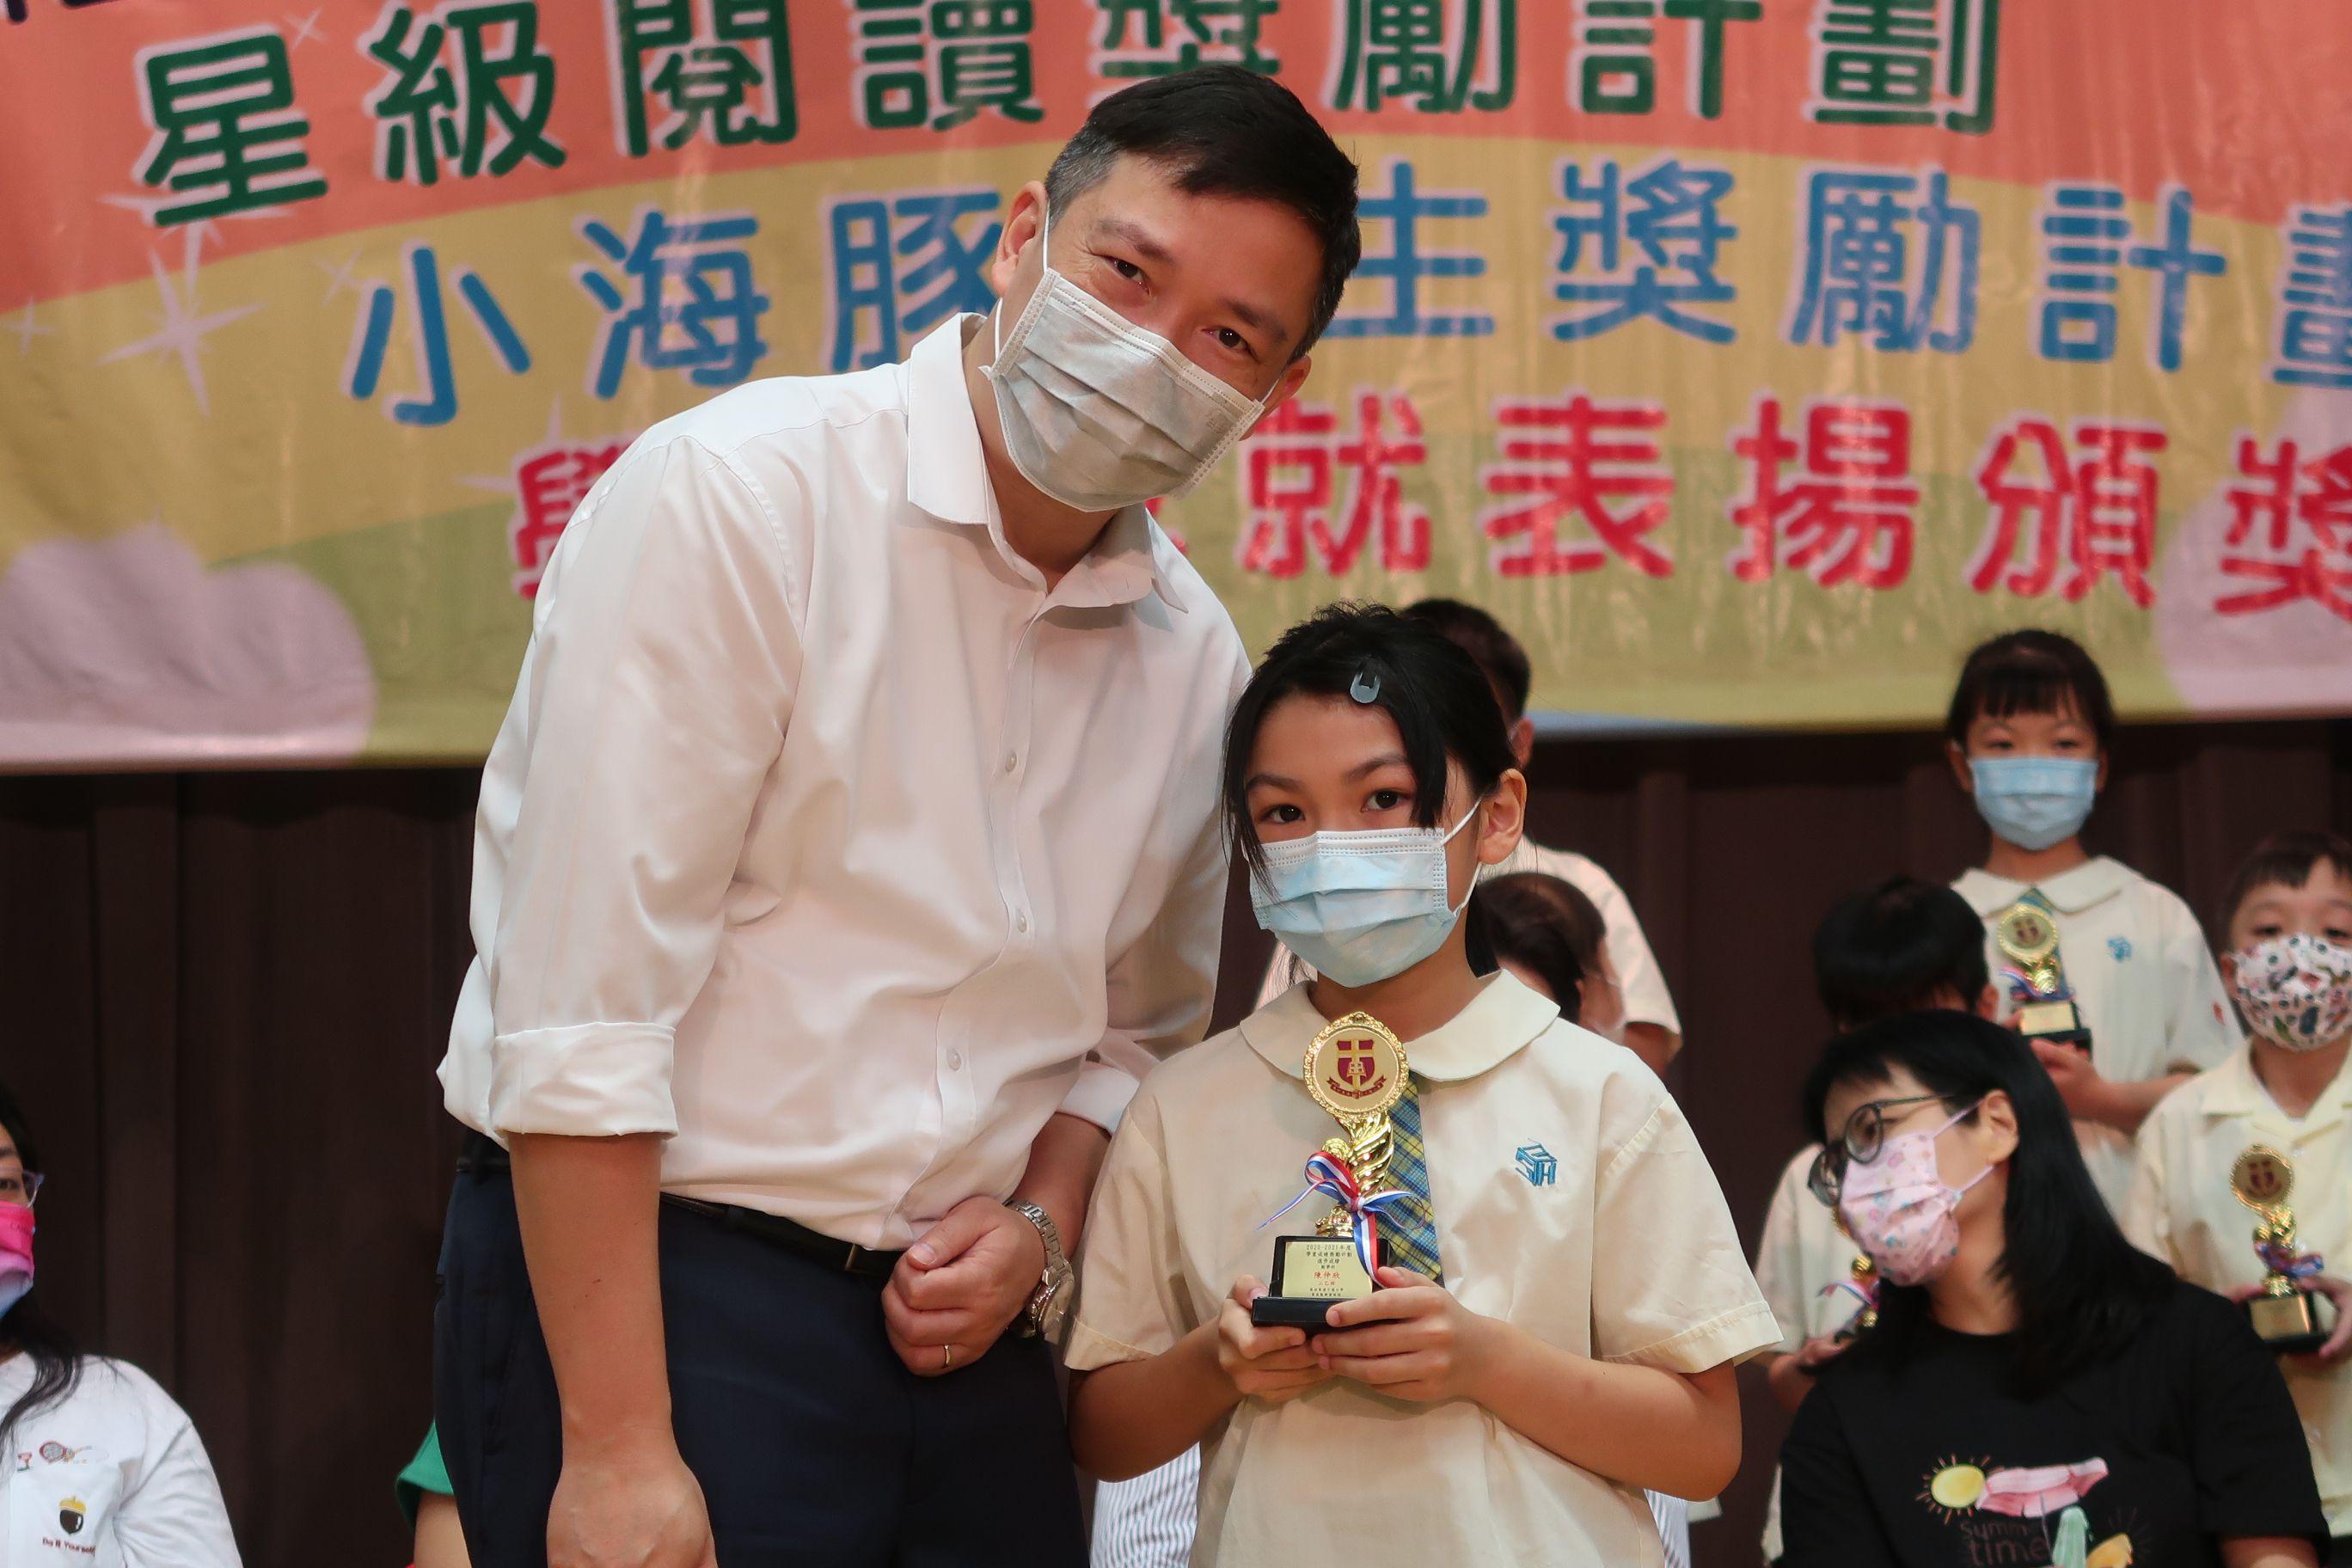 https://syh.edu.hk/sites/default/files/img_5658.jpg